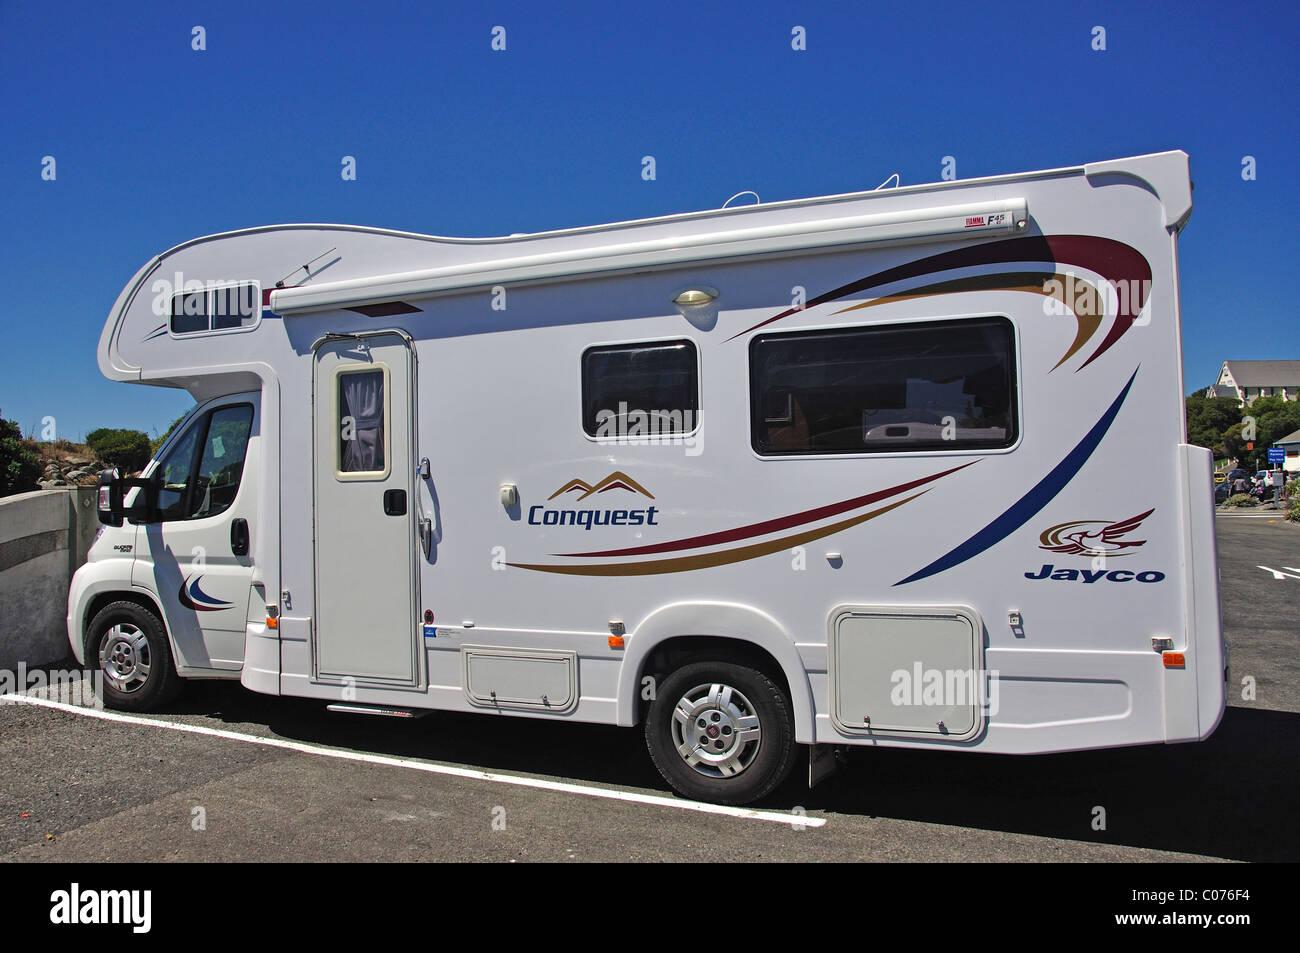 Jayco Conquest Campervan, Esplanade, Kaikoura, Canterbury, South Island, New Zealand Stock Photo